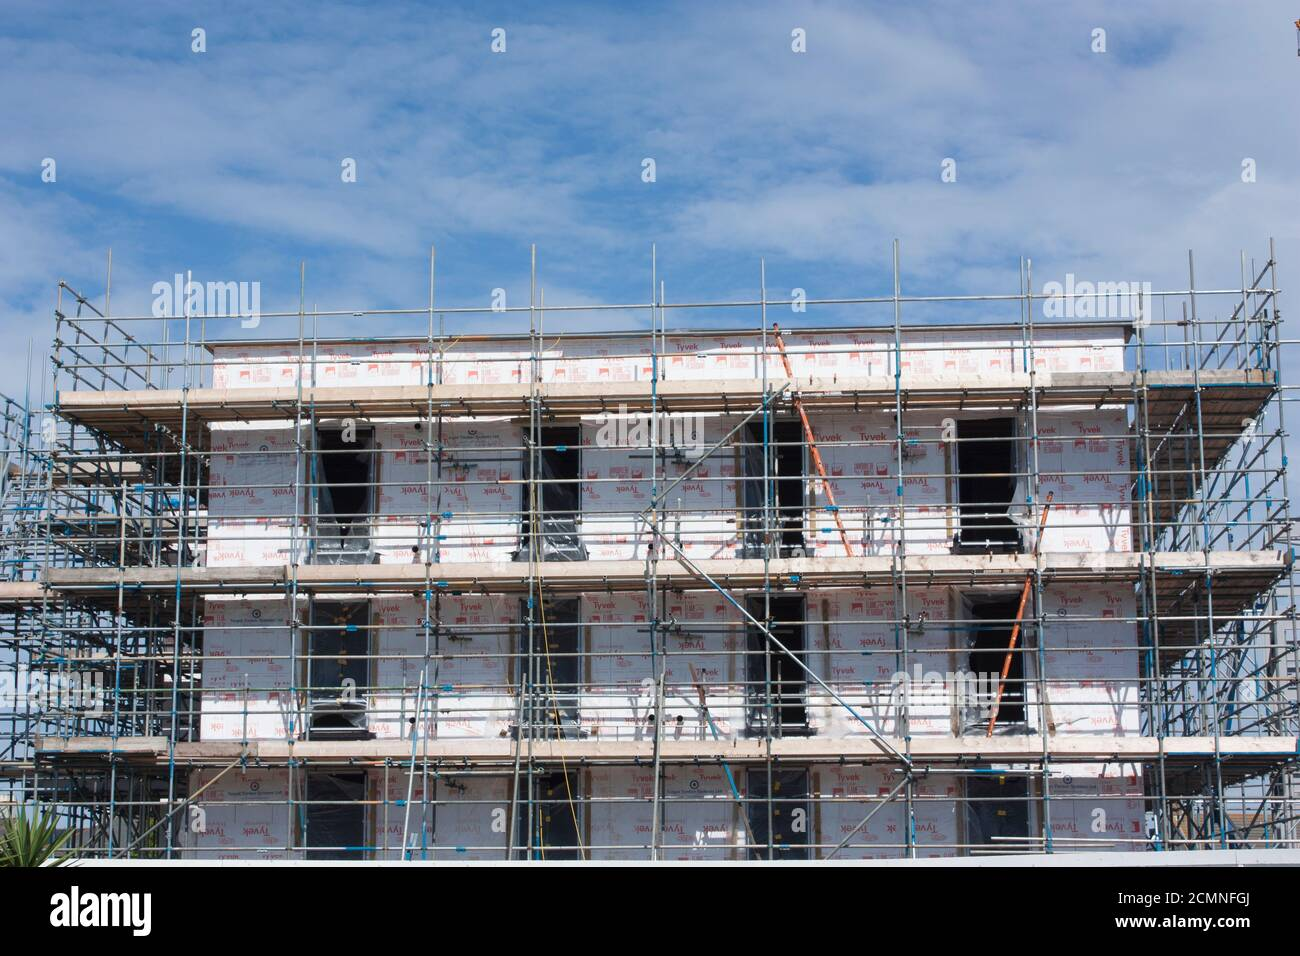 Kanalinseln. Guernsey. Admiral Park. Baustelle. Neues Premier Inn Gebäude. Stockfoto